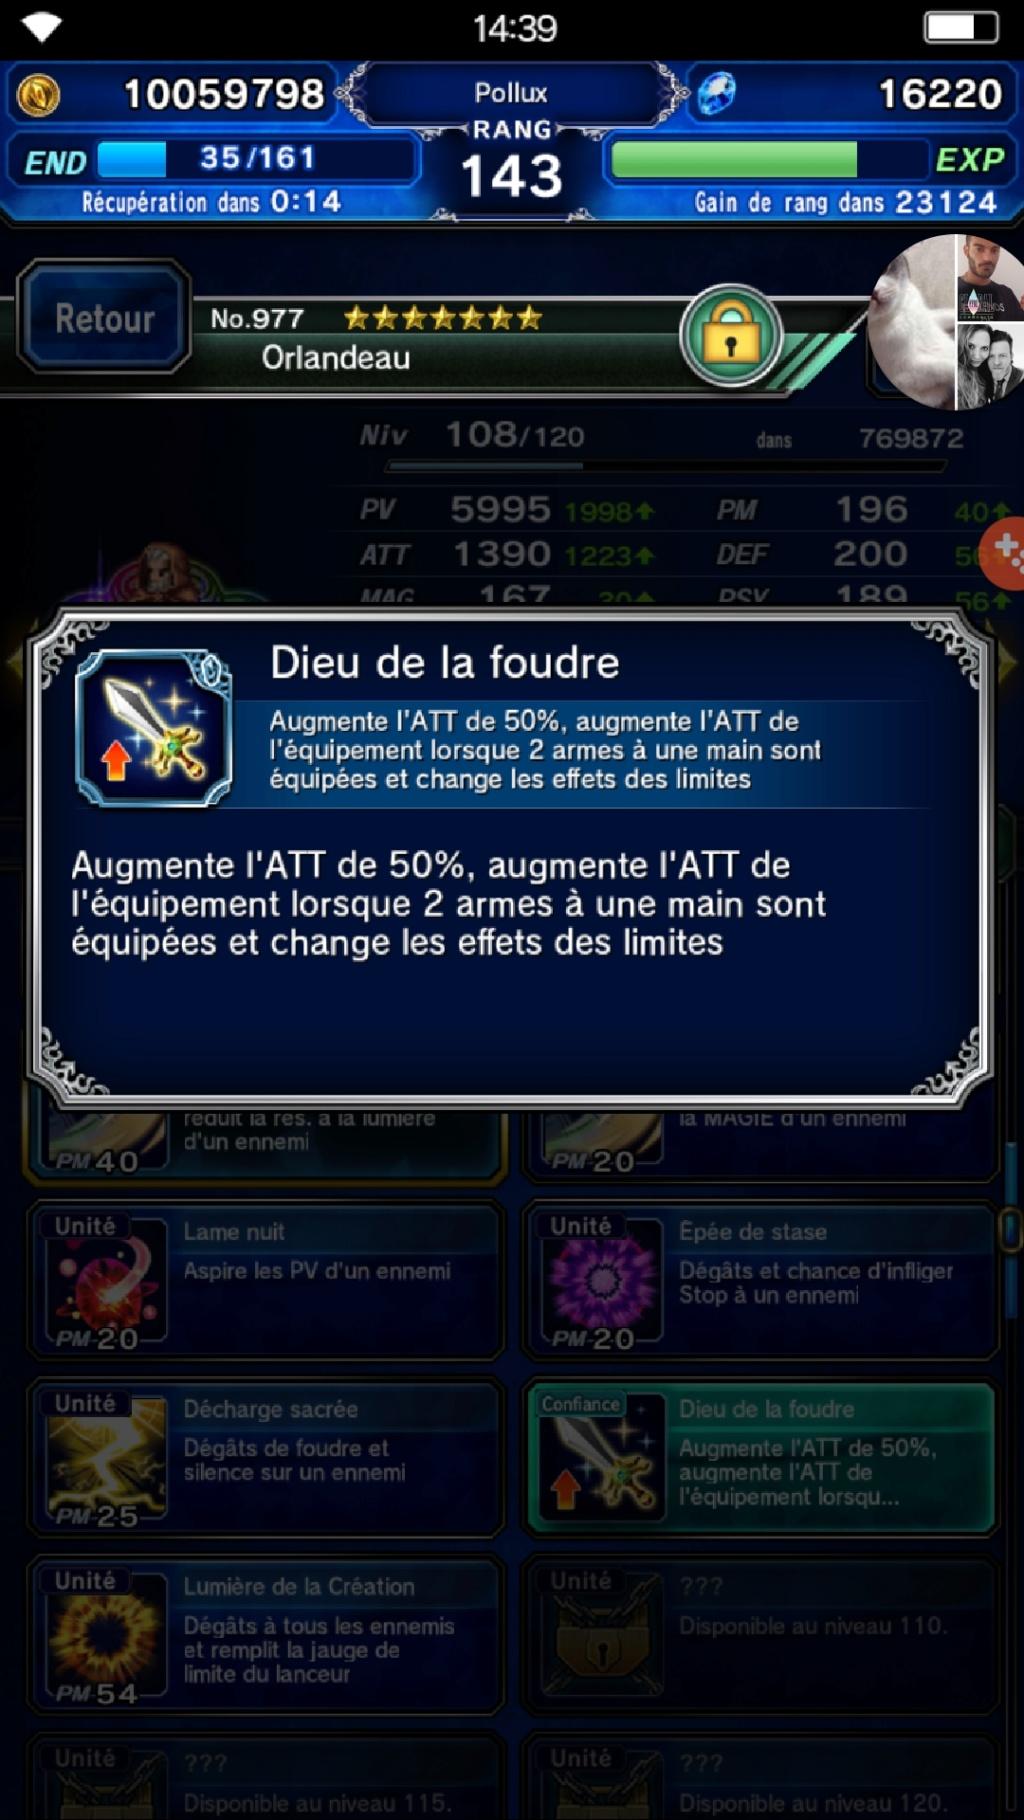 Invocation du moment - FFVIII - Bannière Squall/Rinoa - Page 3 Screen13